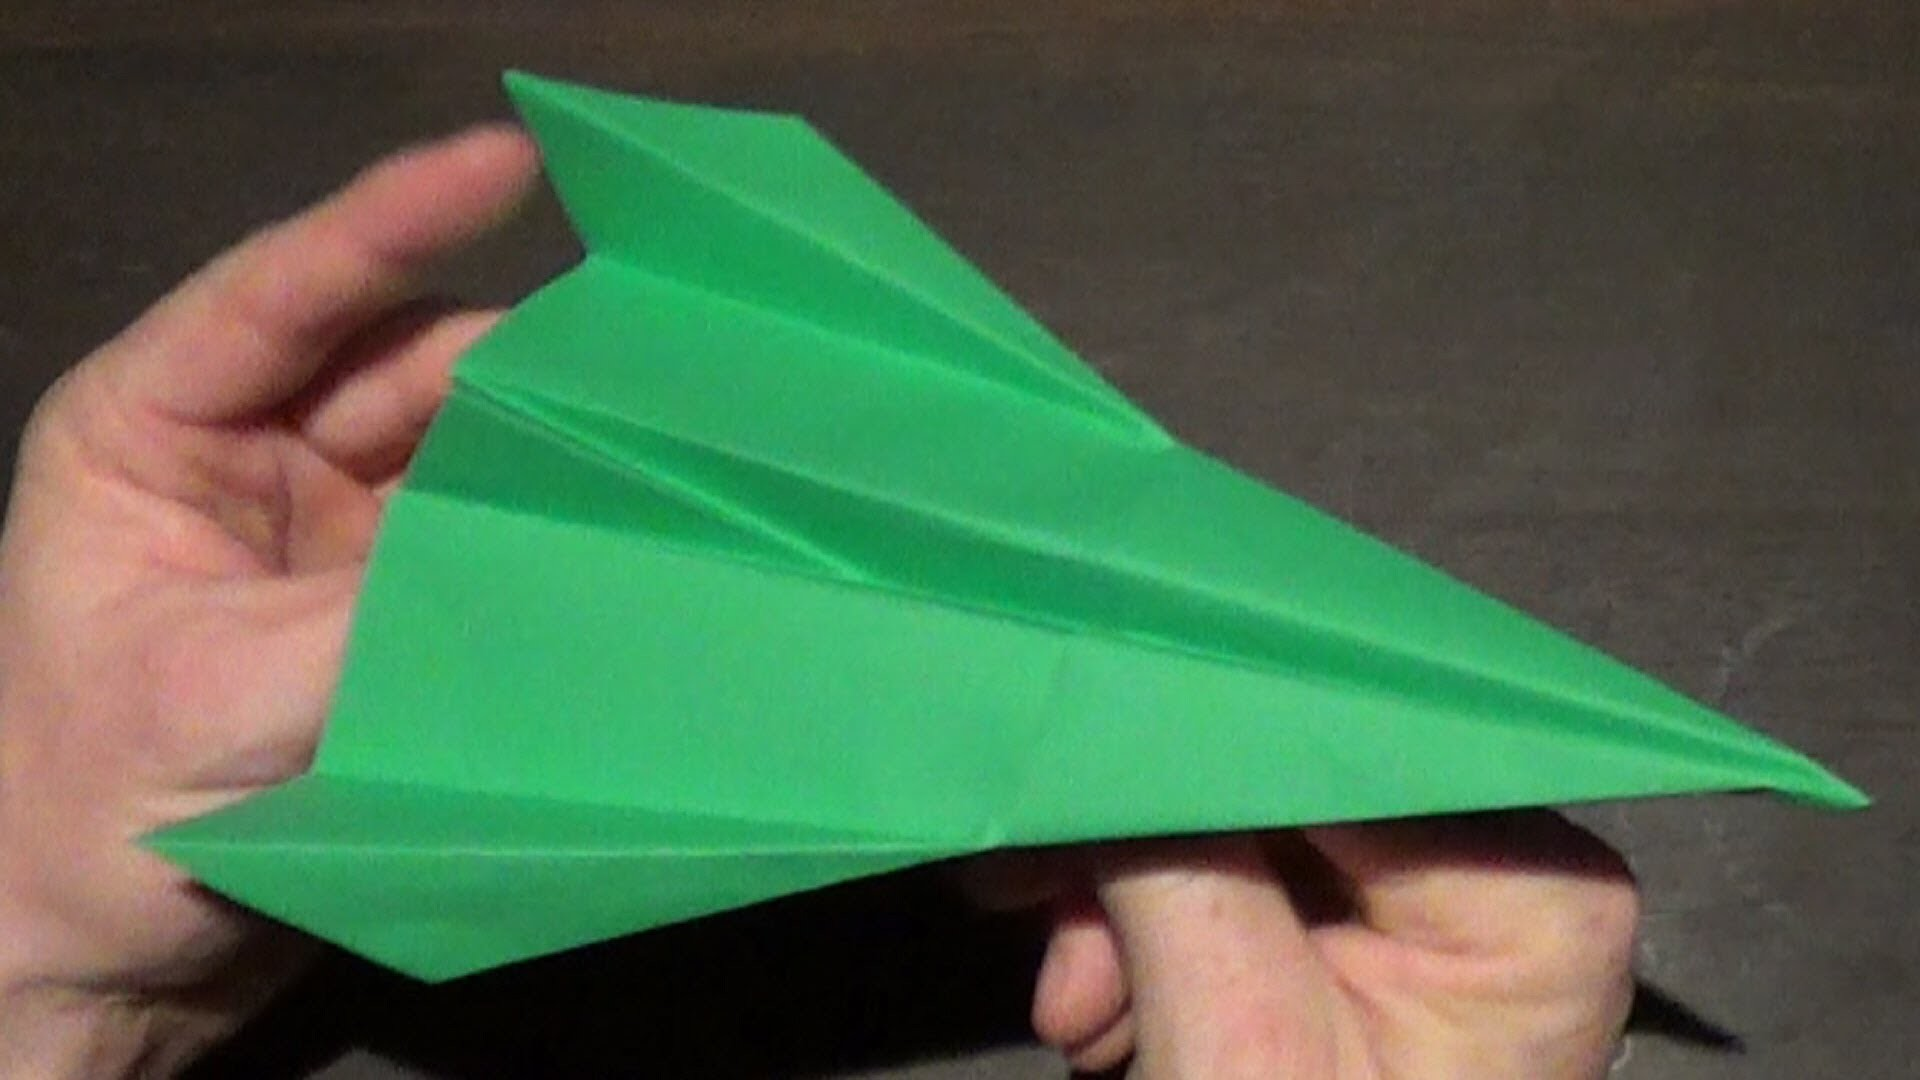 Awsome paper airplaneTutorial  - How to make a Slick Paper Airplane